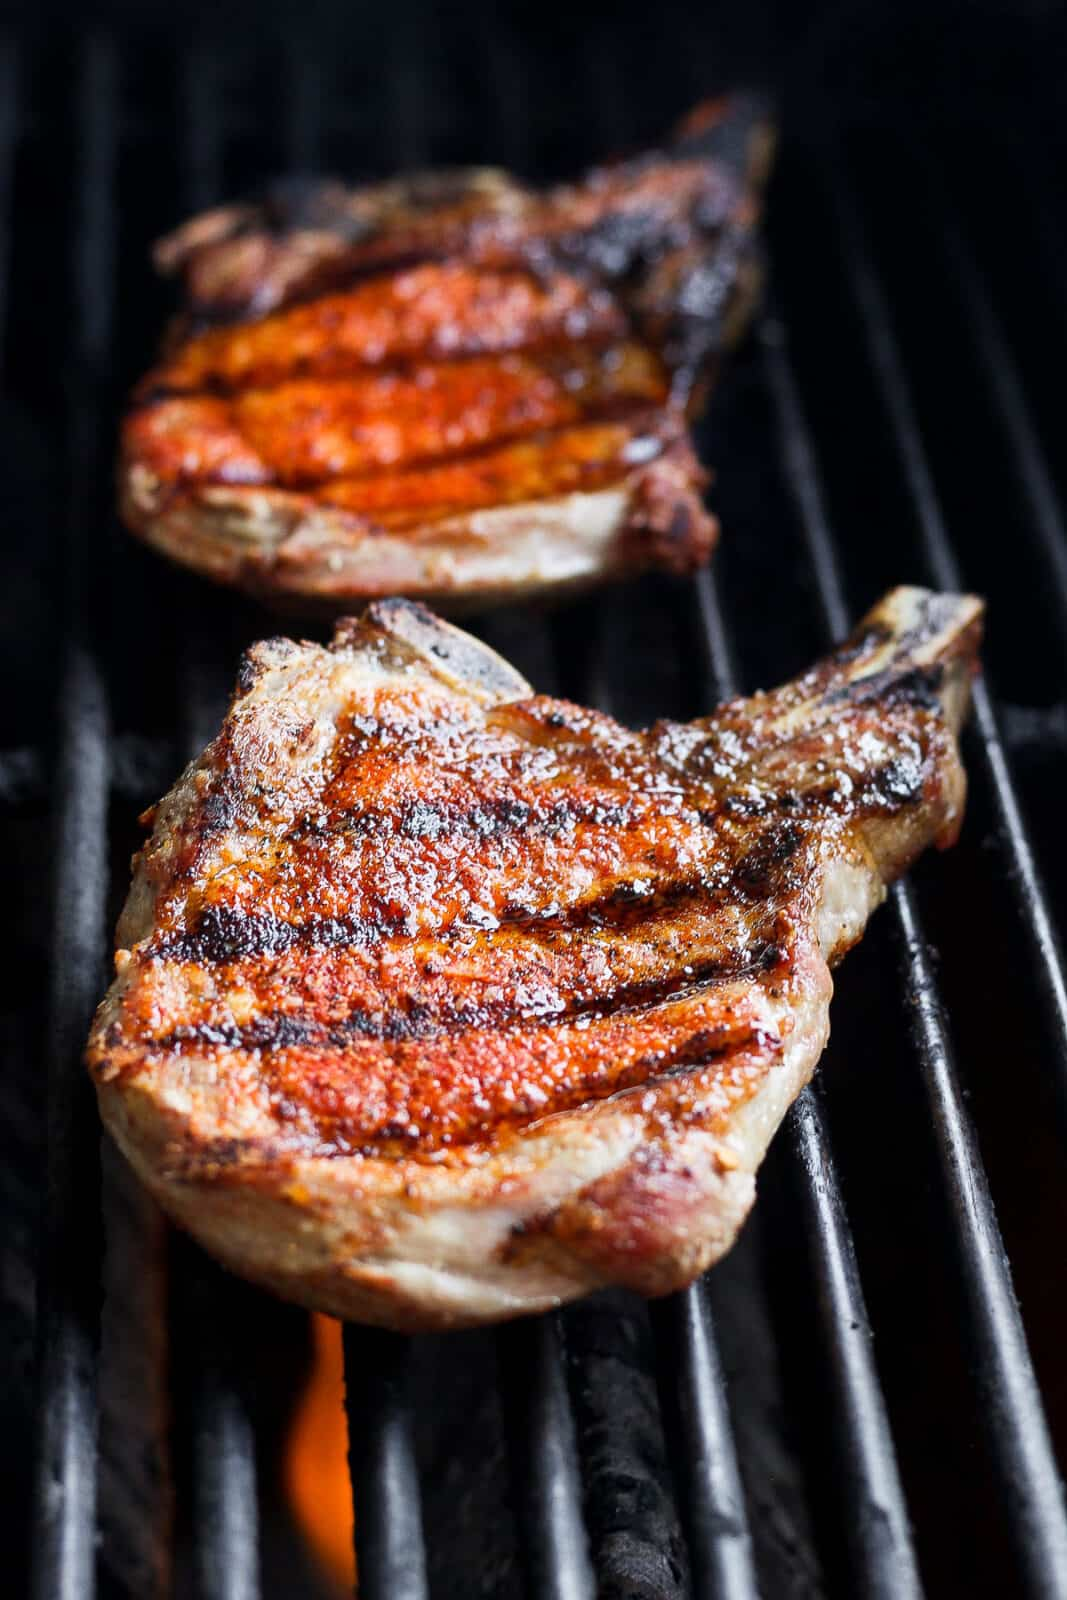 Seasoned pork chops on the grill.